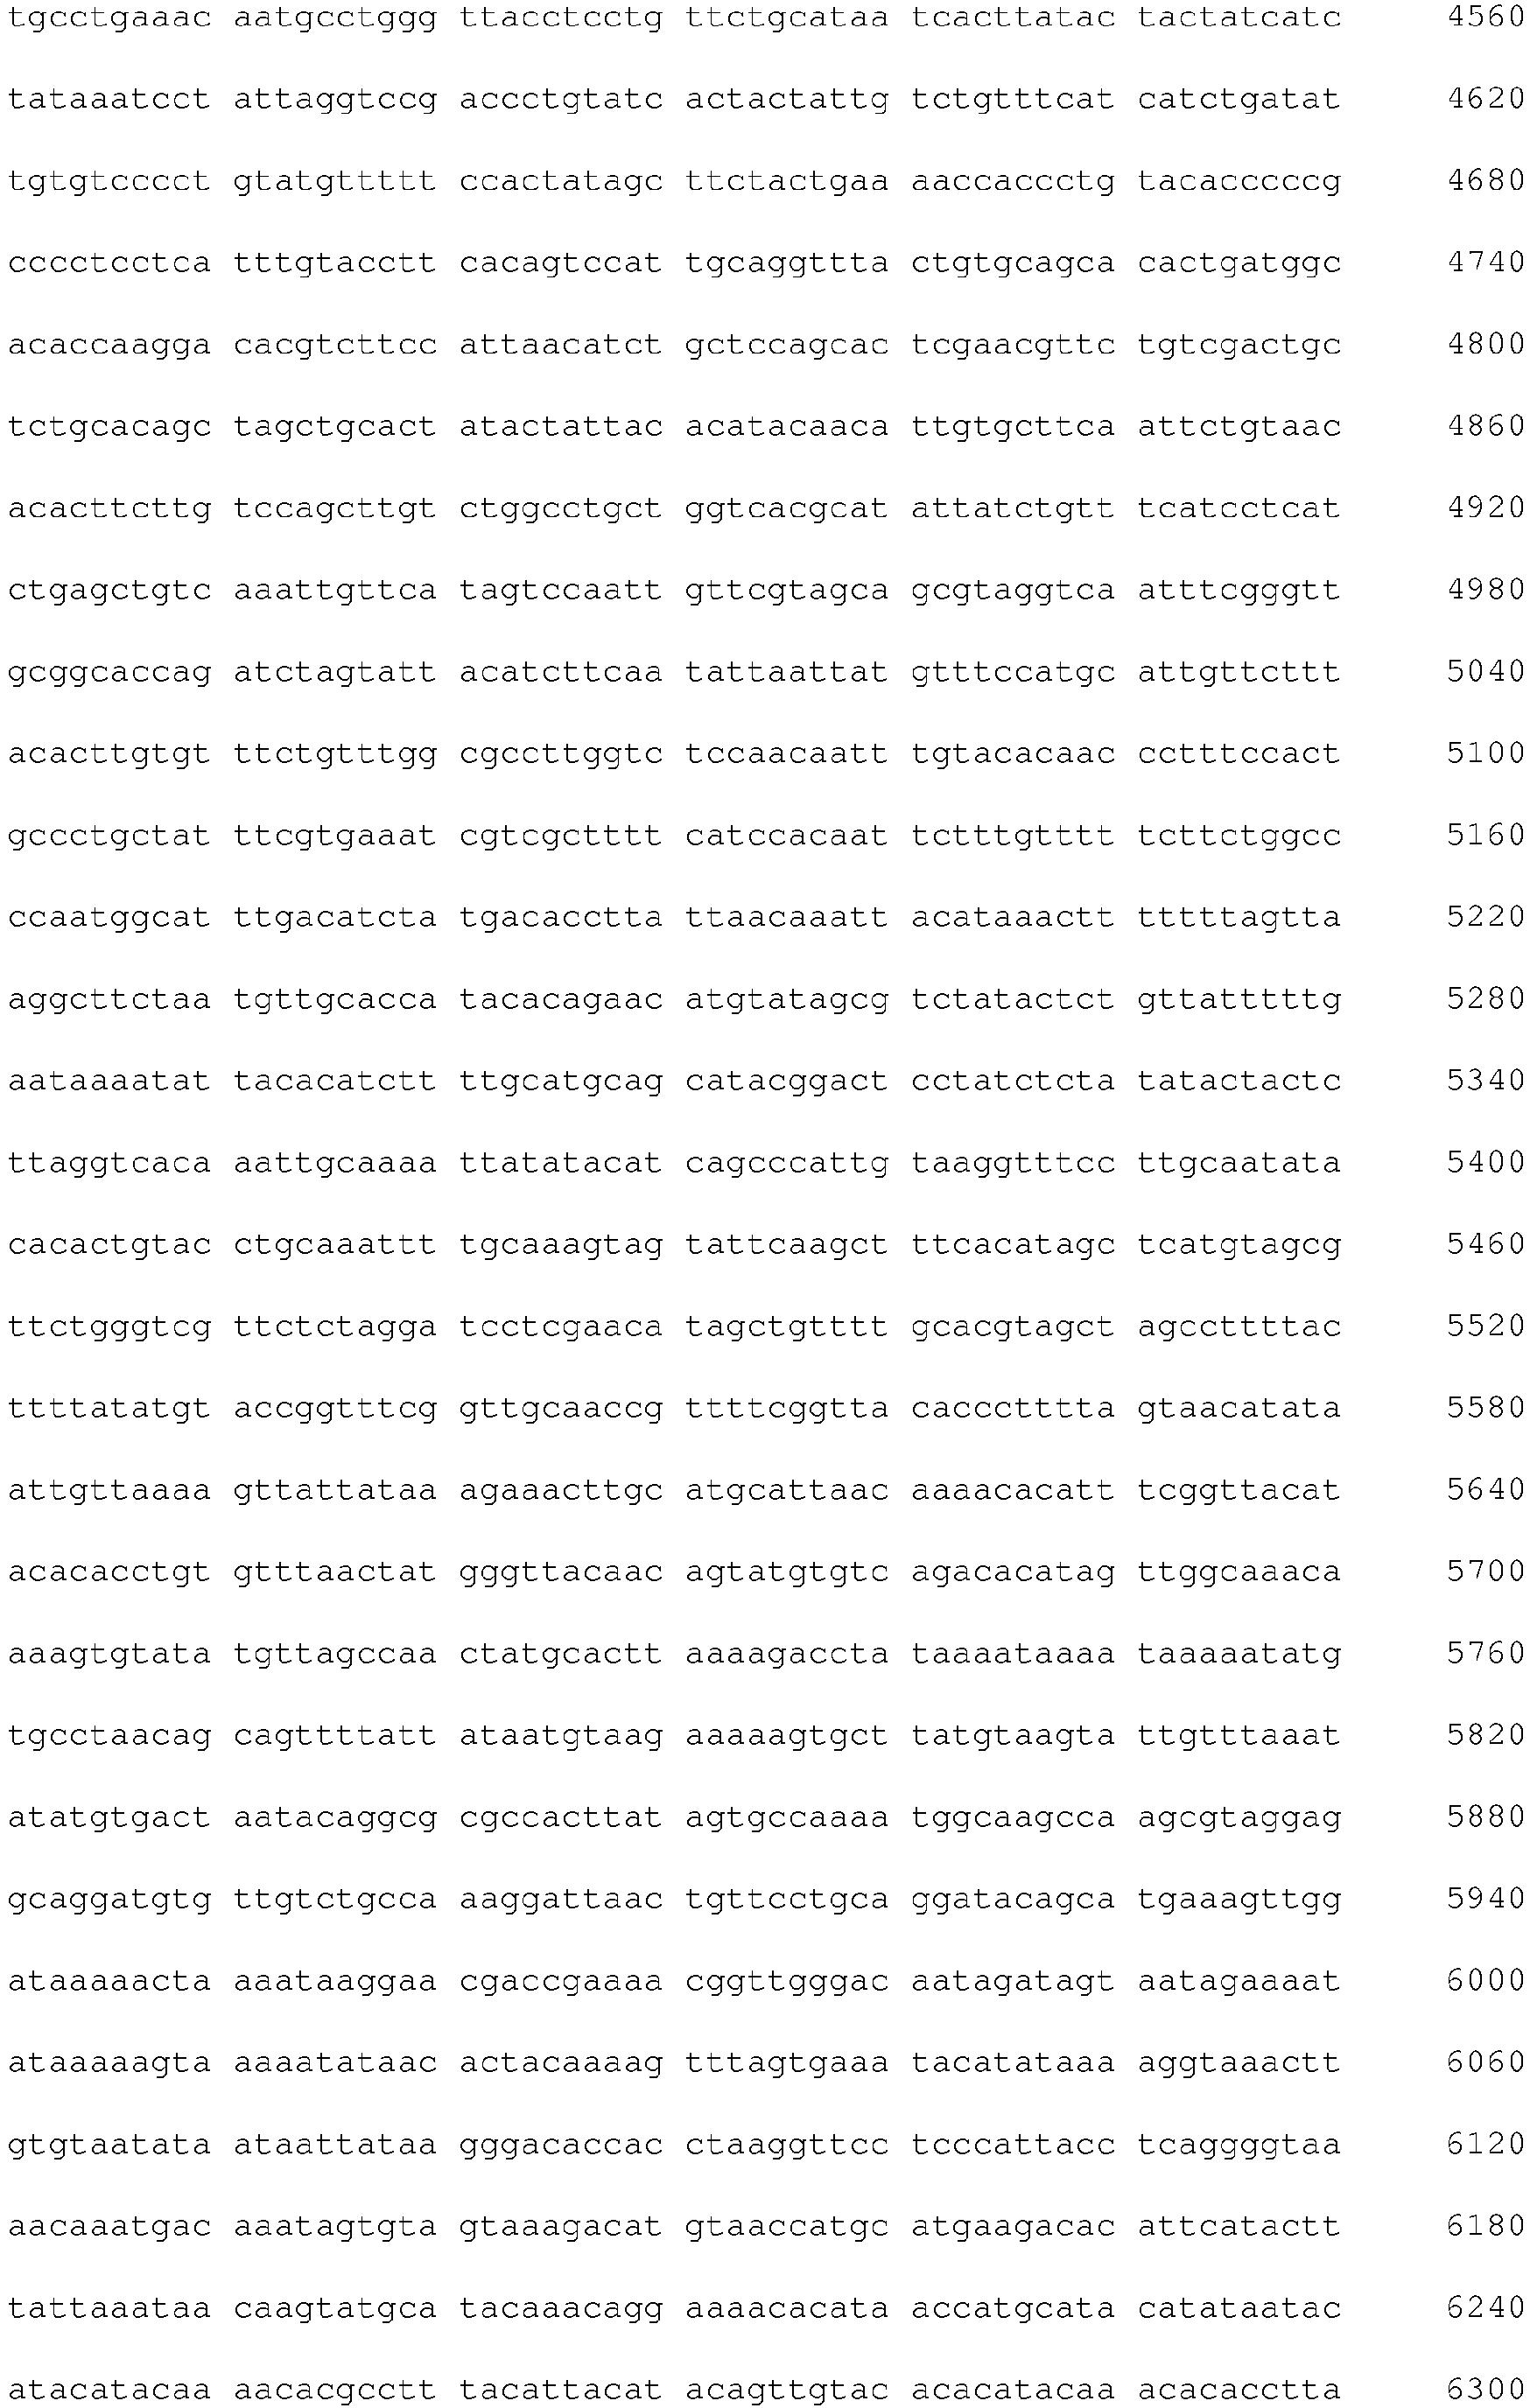 Figure imgb0400